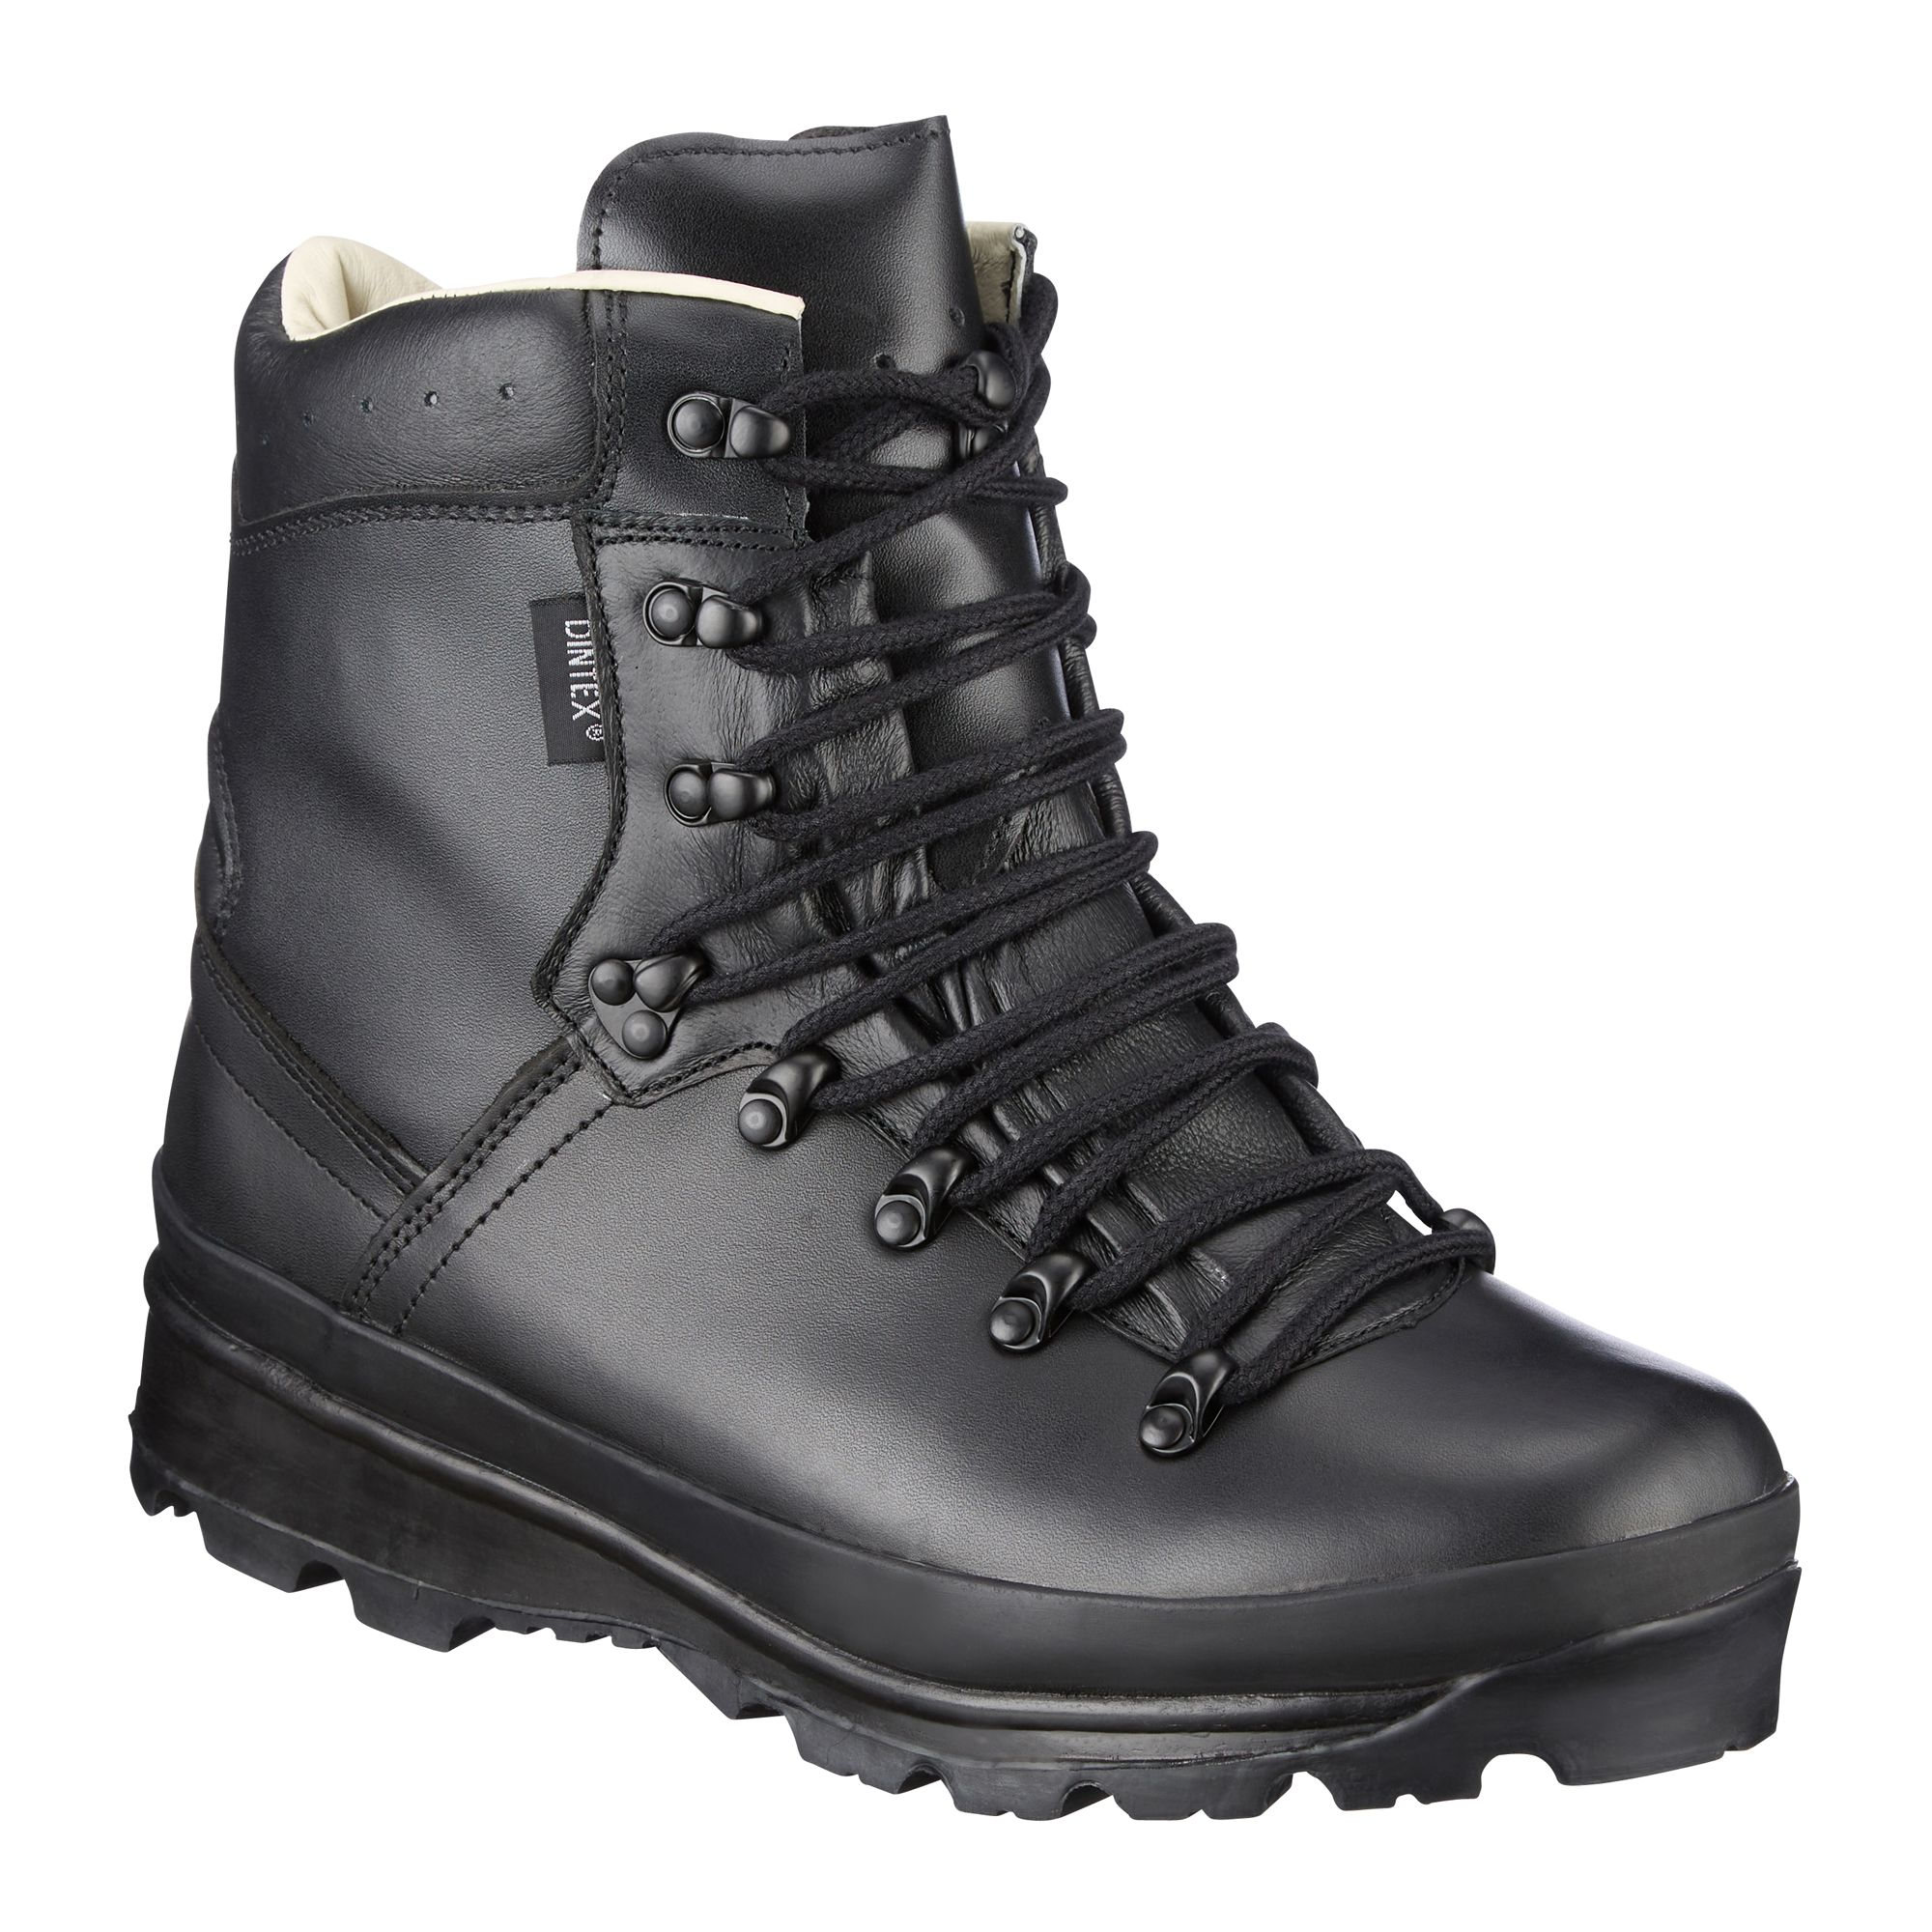 Stiefel schwarz leder 43 Soldat Armee style Boots